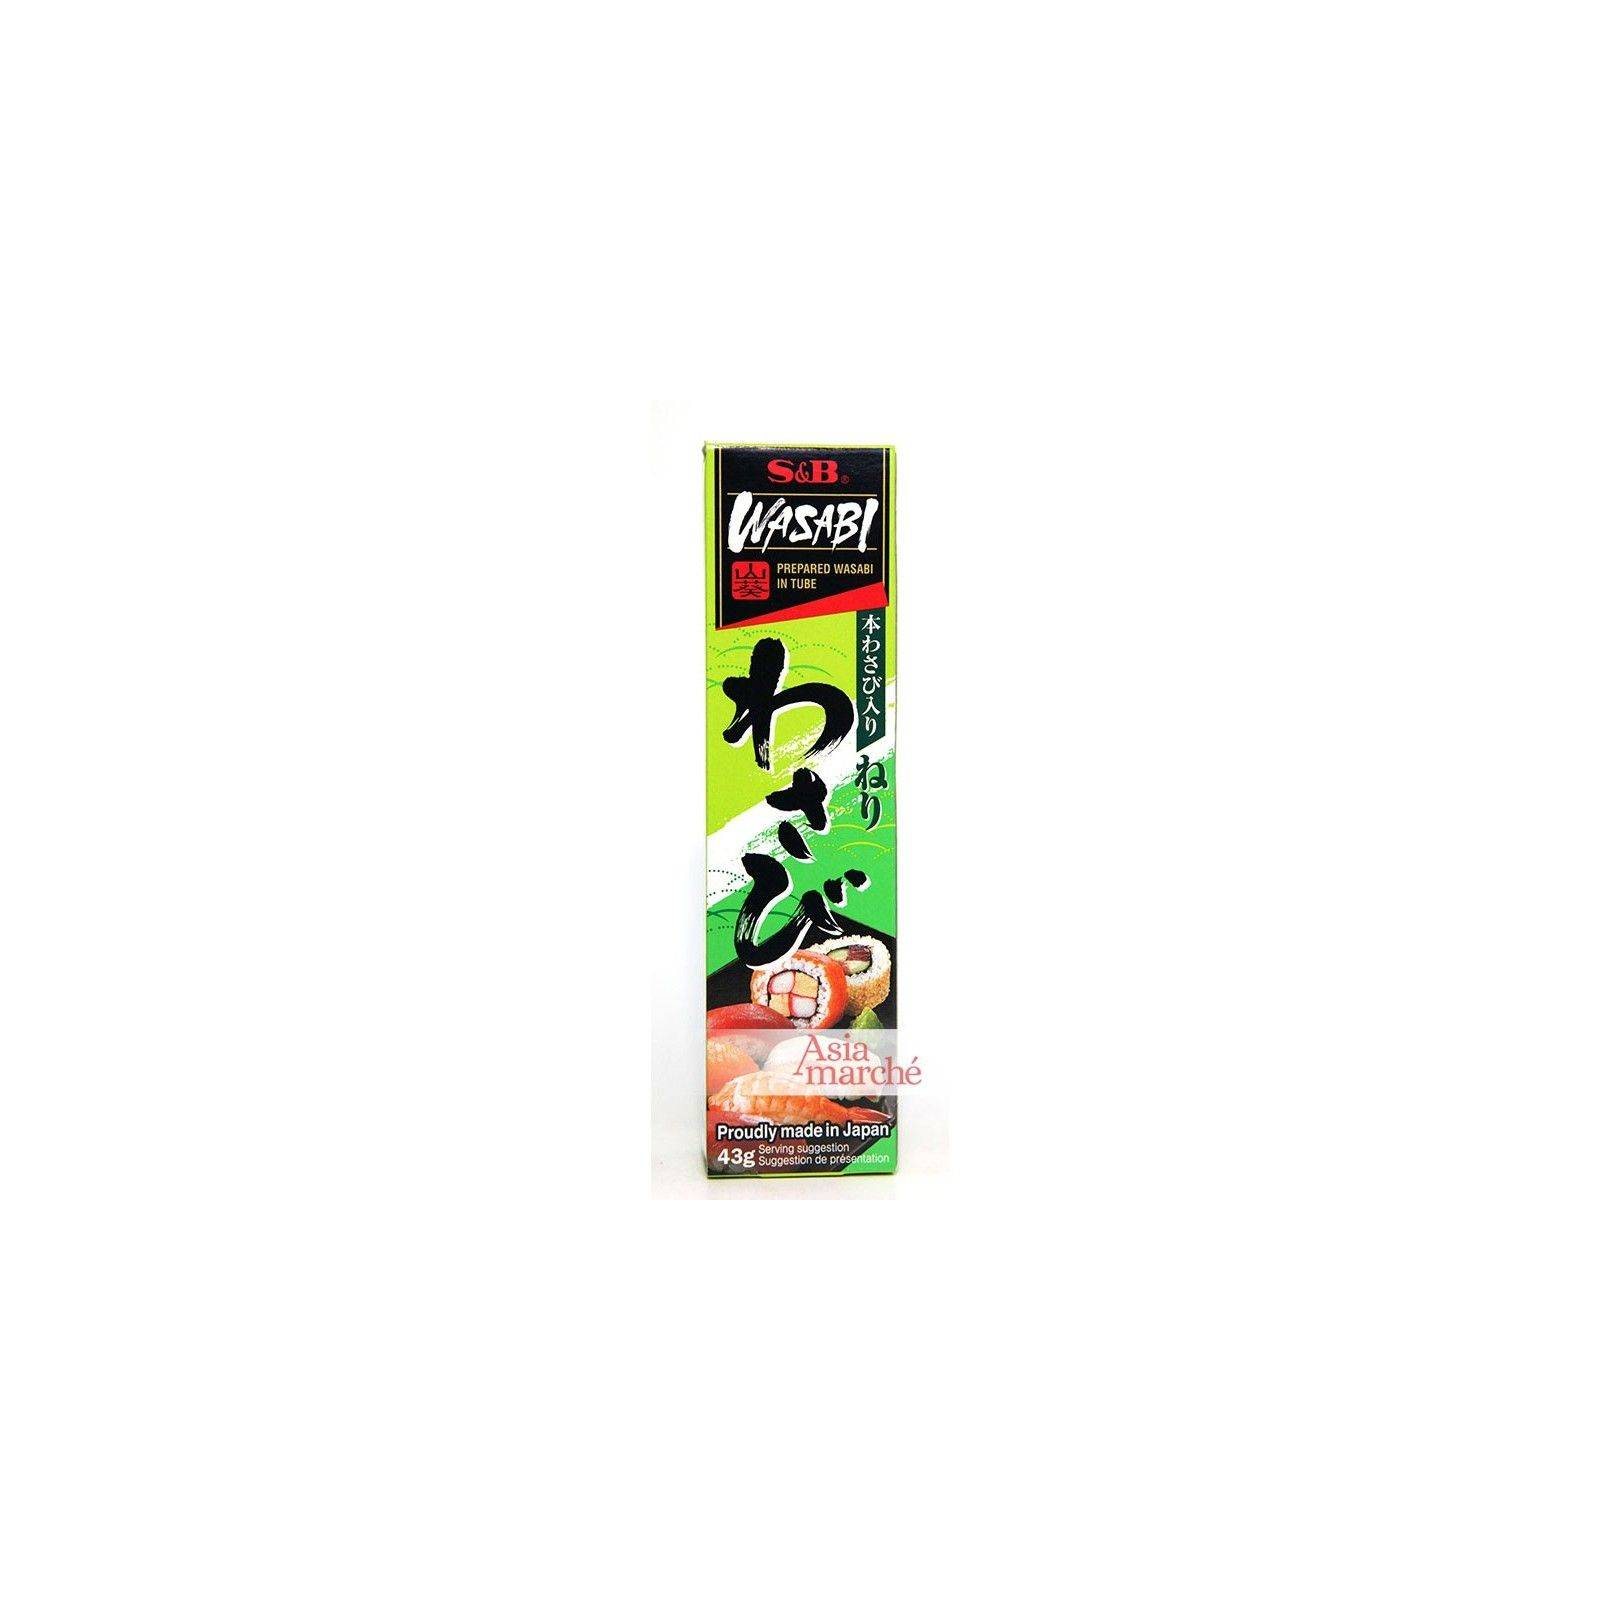 Asia Marché Wasabi en tube S&B; 43g